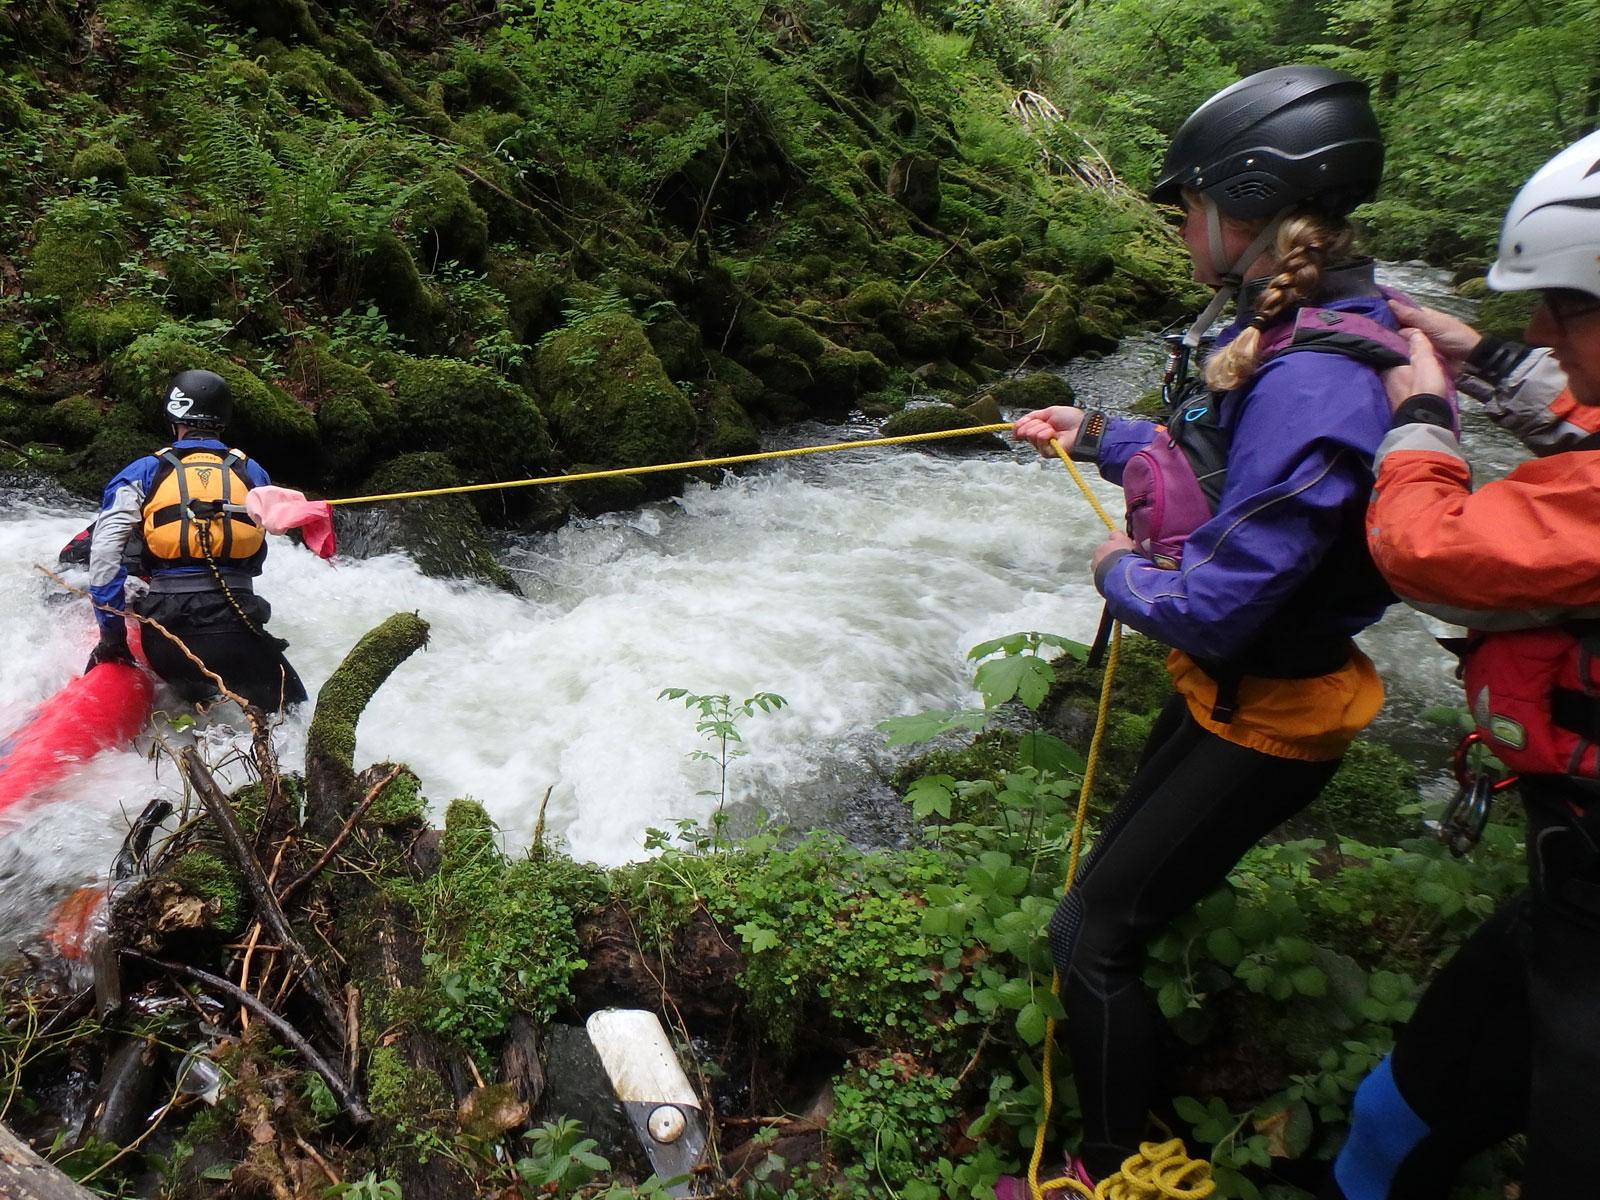 Veiligheid en EHBO river rescue cursussen en trainigen